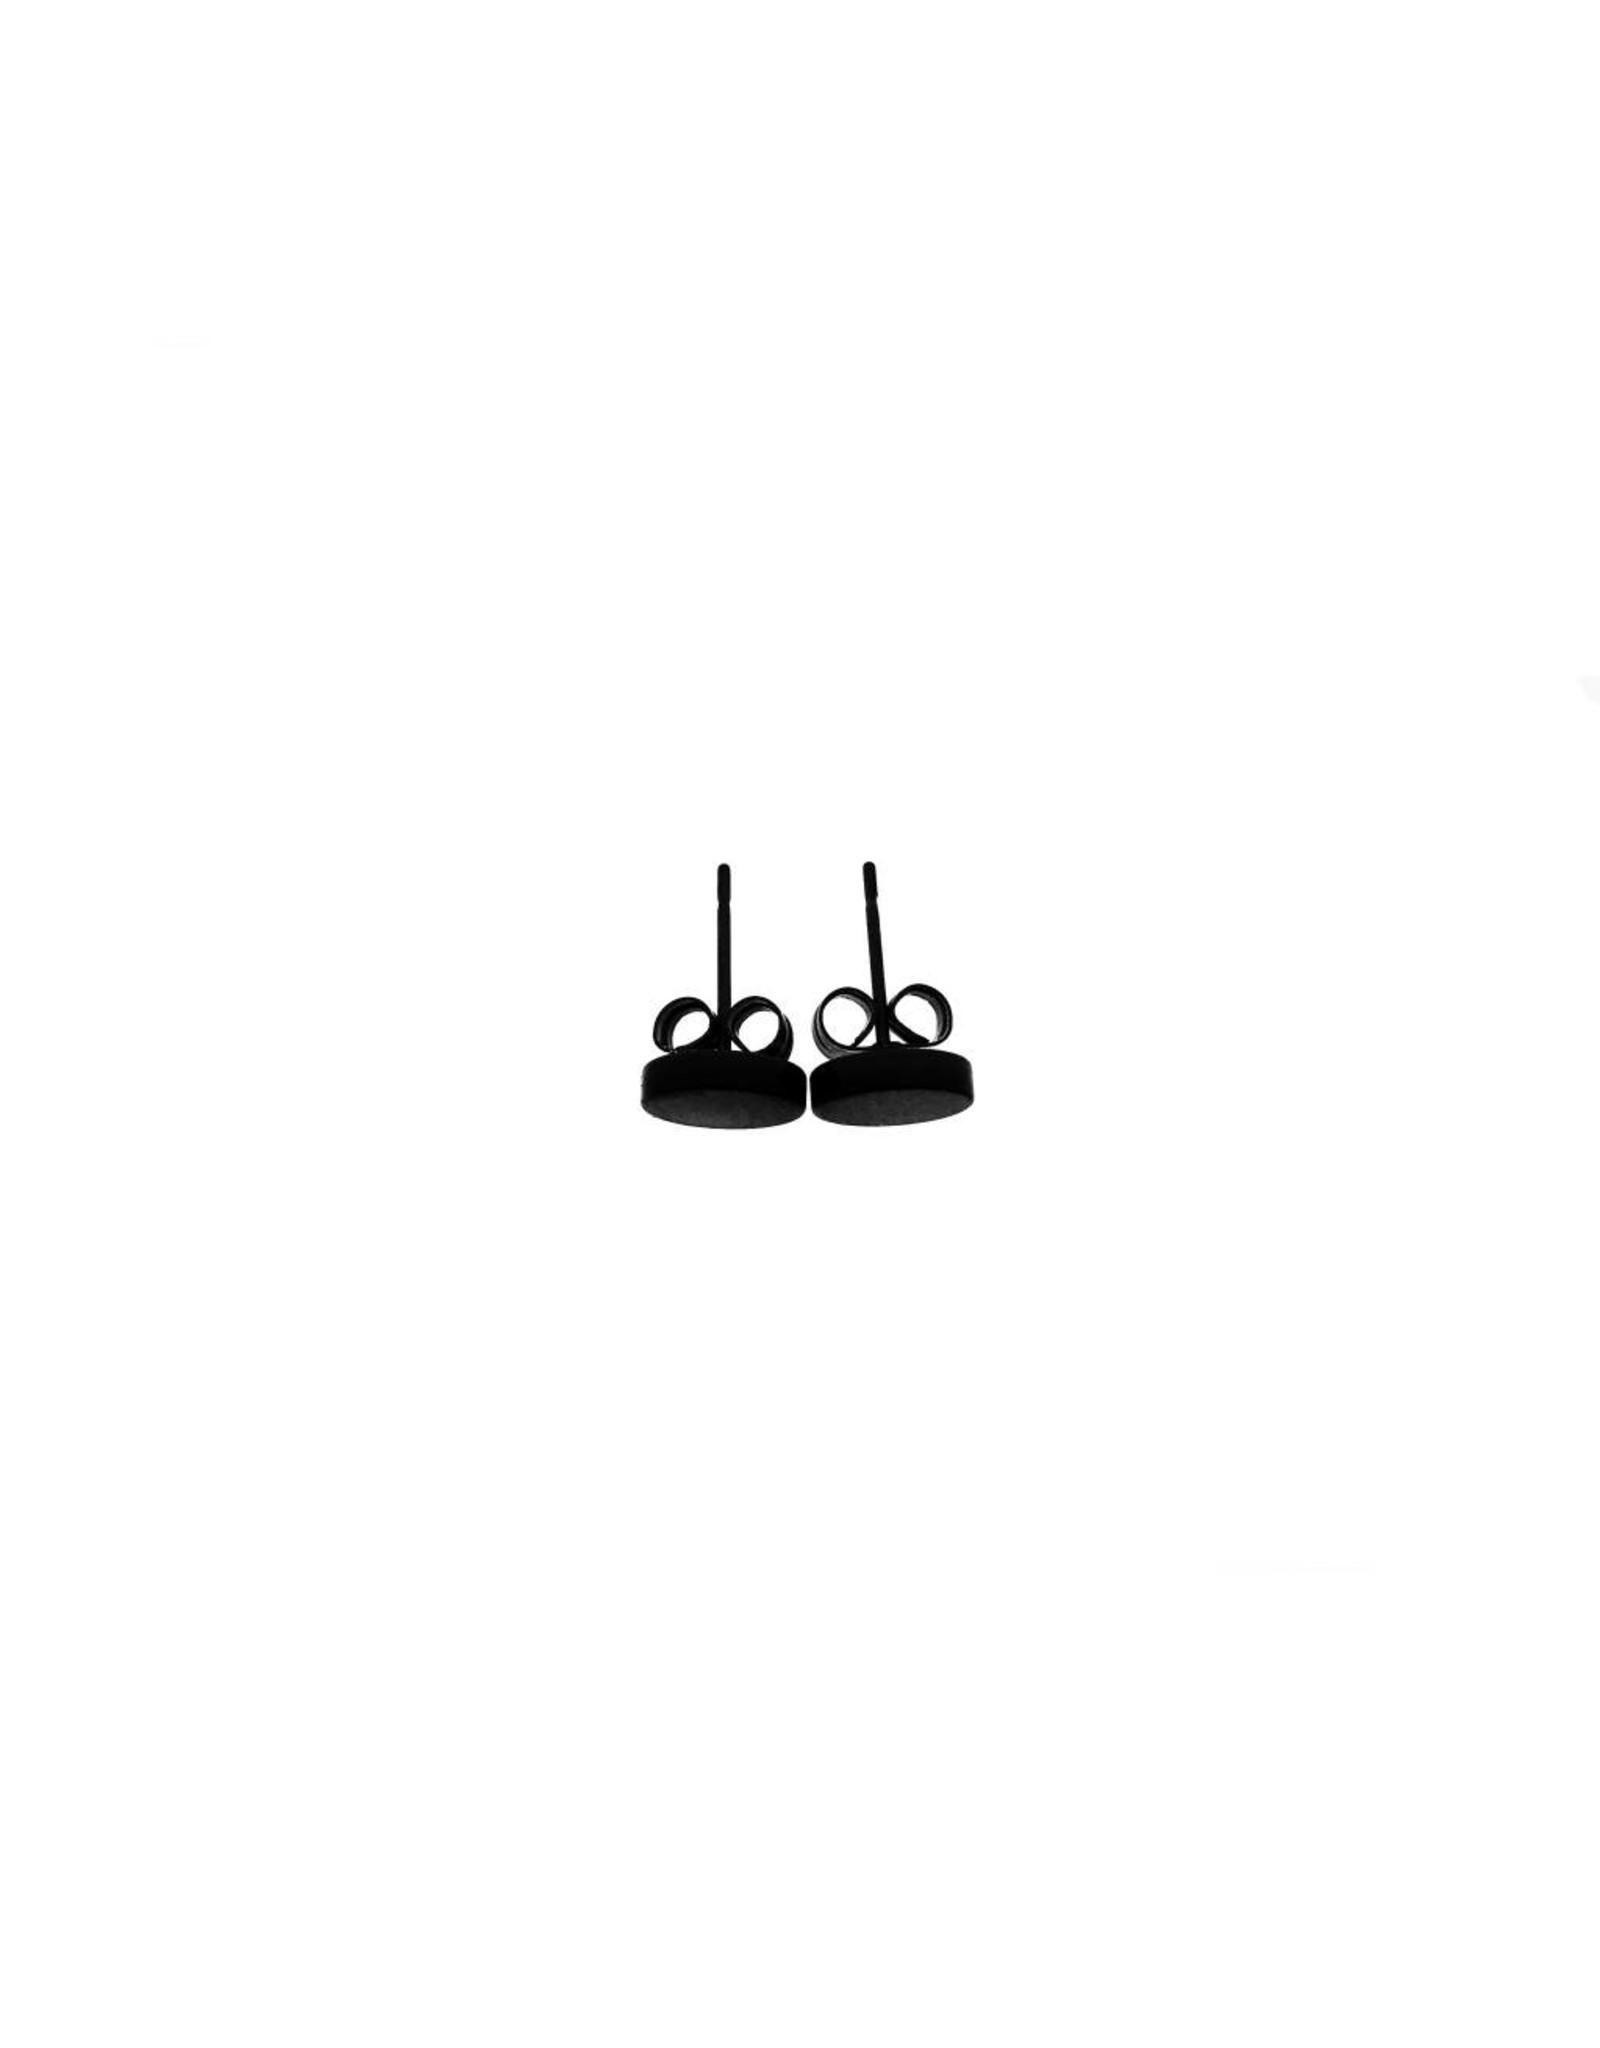 Stekertjes zwart cirkel 8mm